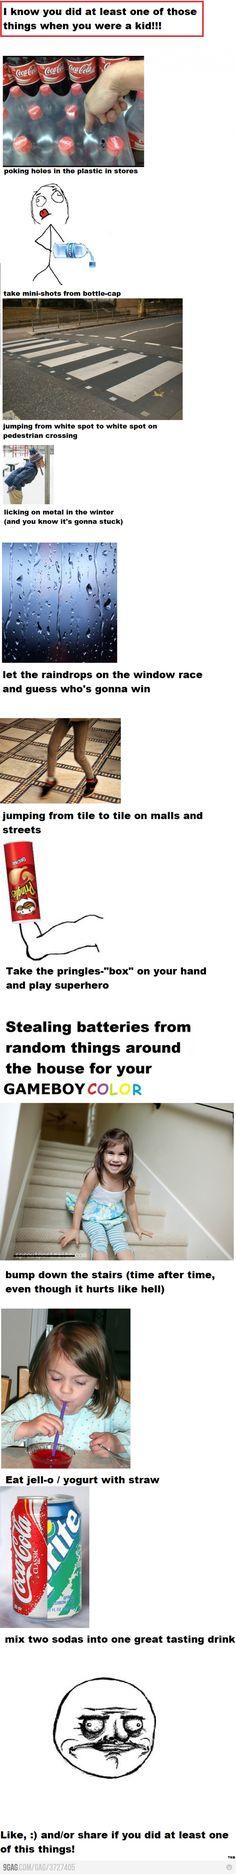 haha great! But I didn't do the pole, Pringles, or jello